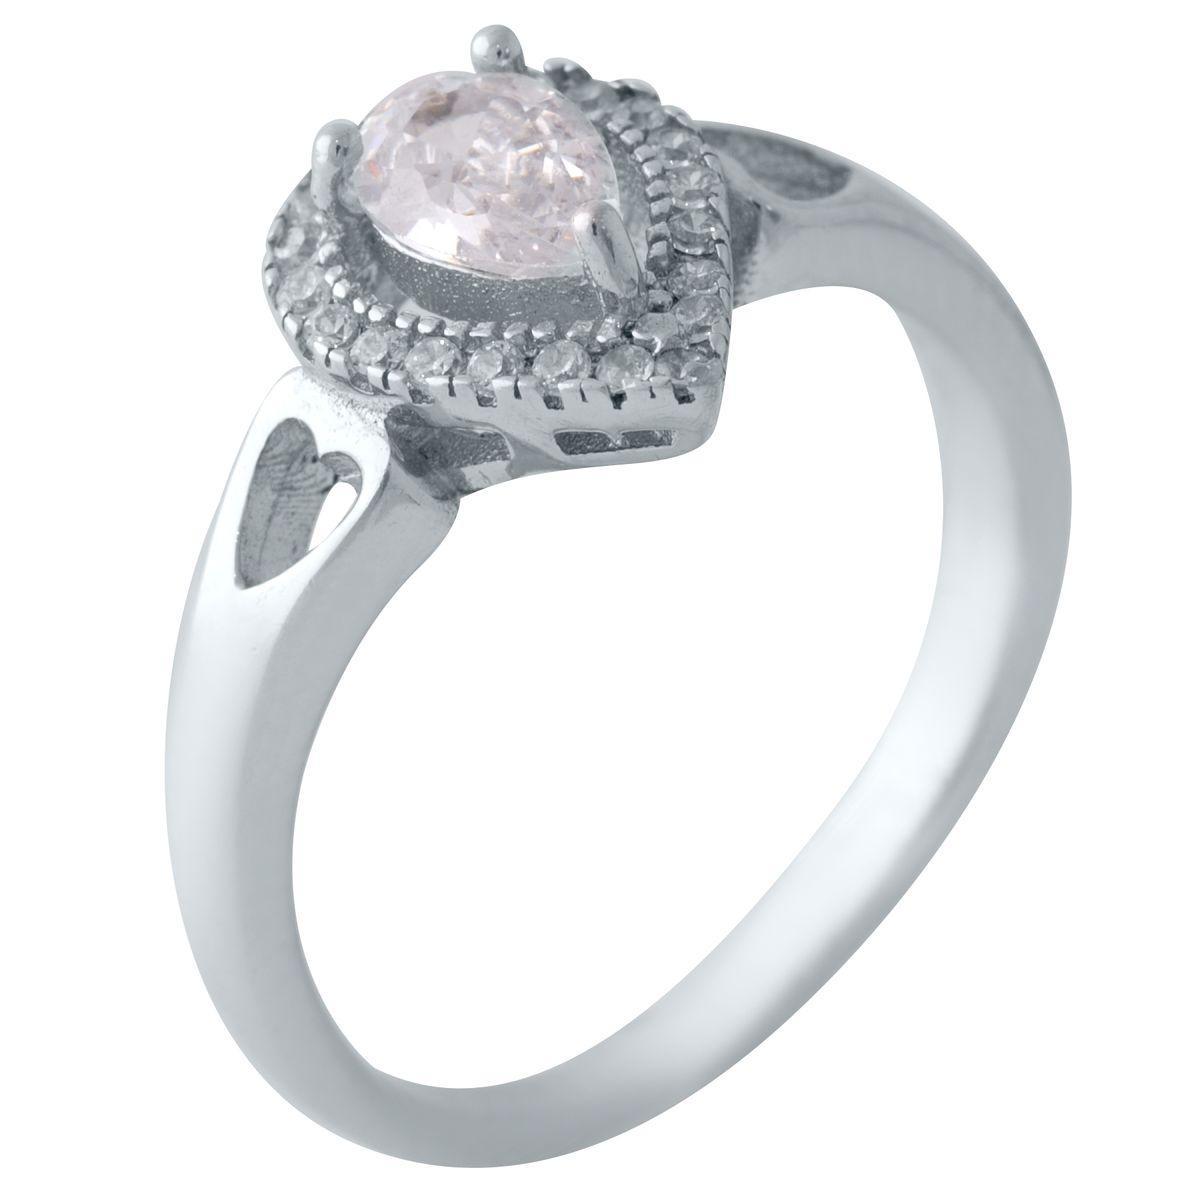 Серебряное кольцо DreamJewelry с фианитами (2011323) 16 размер